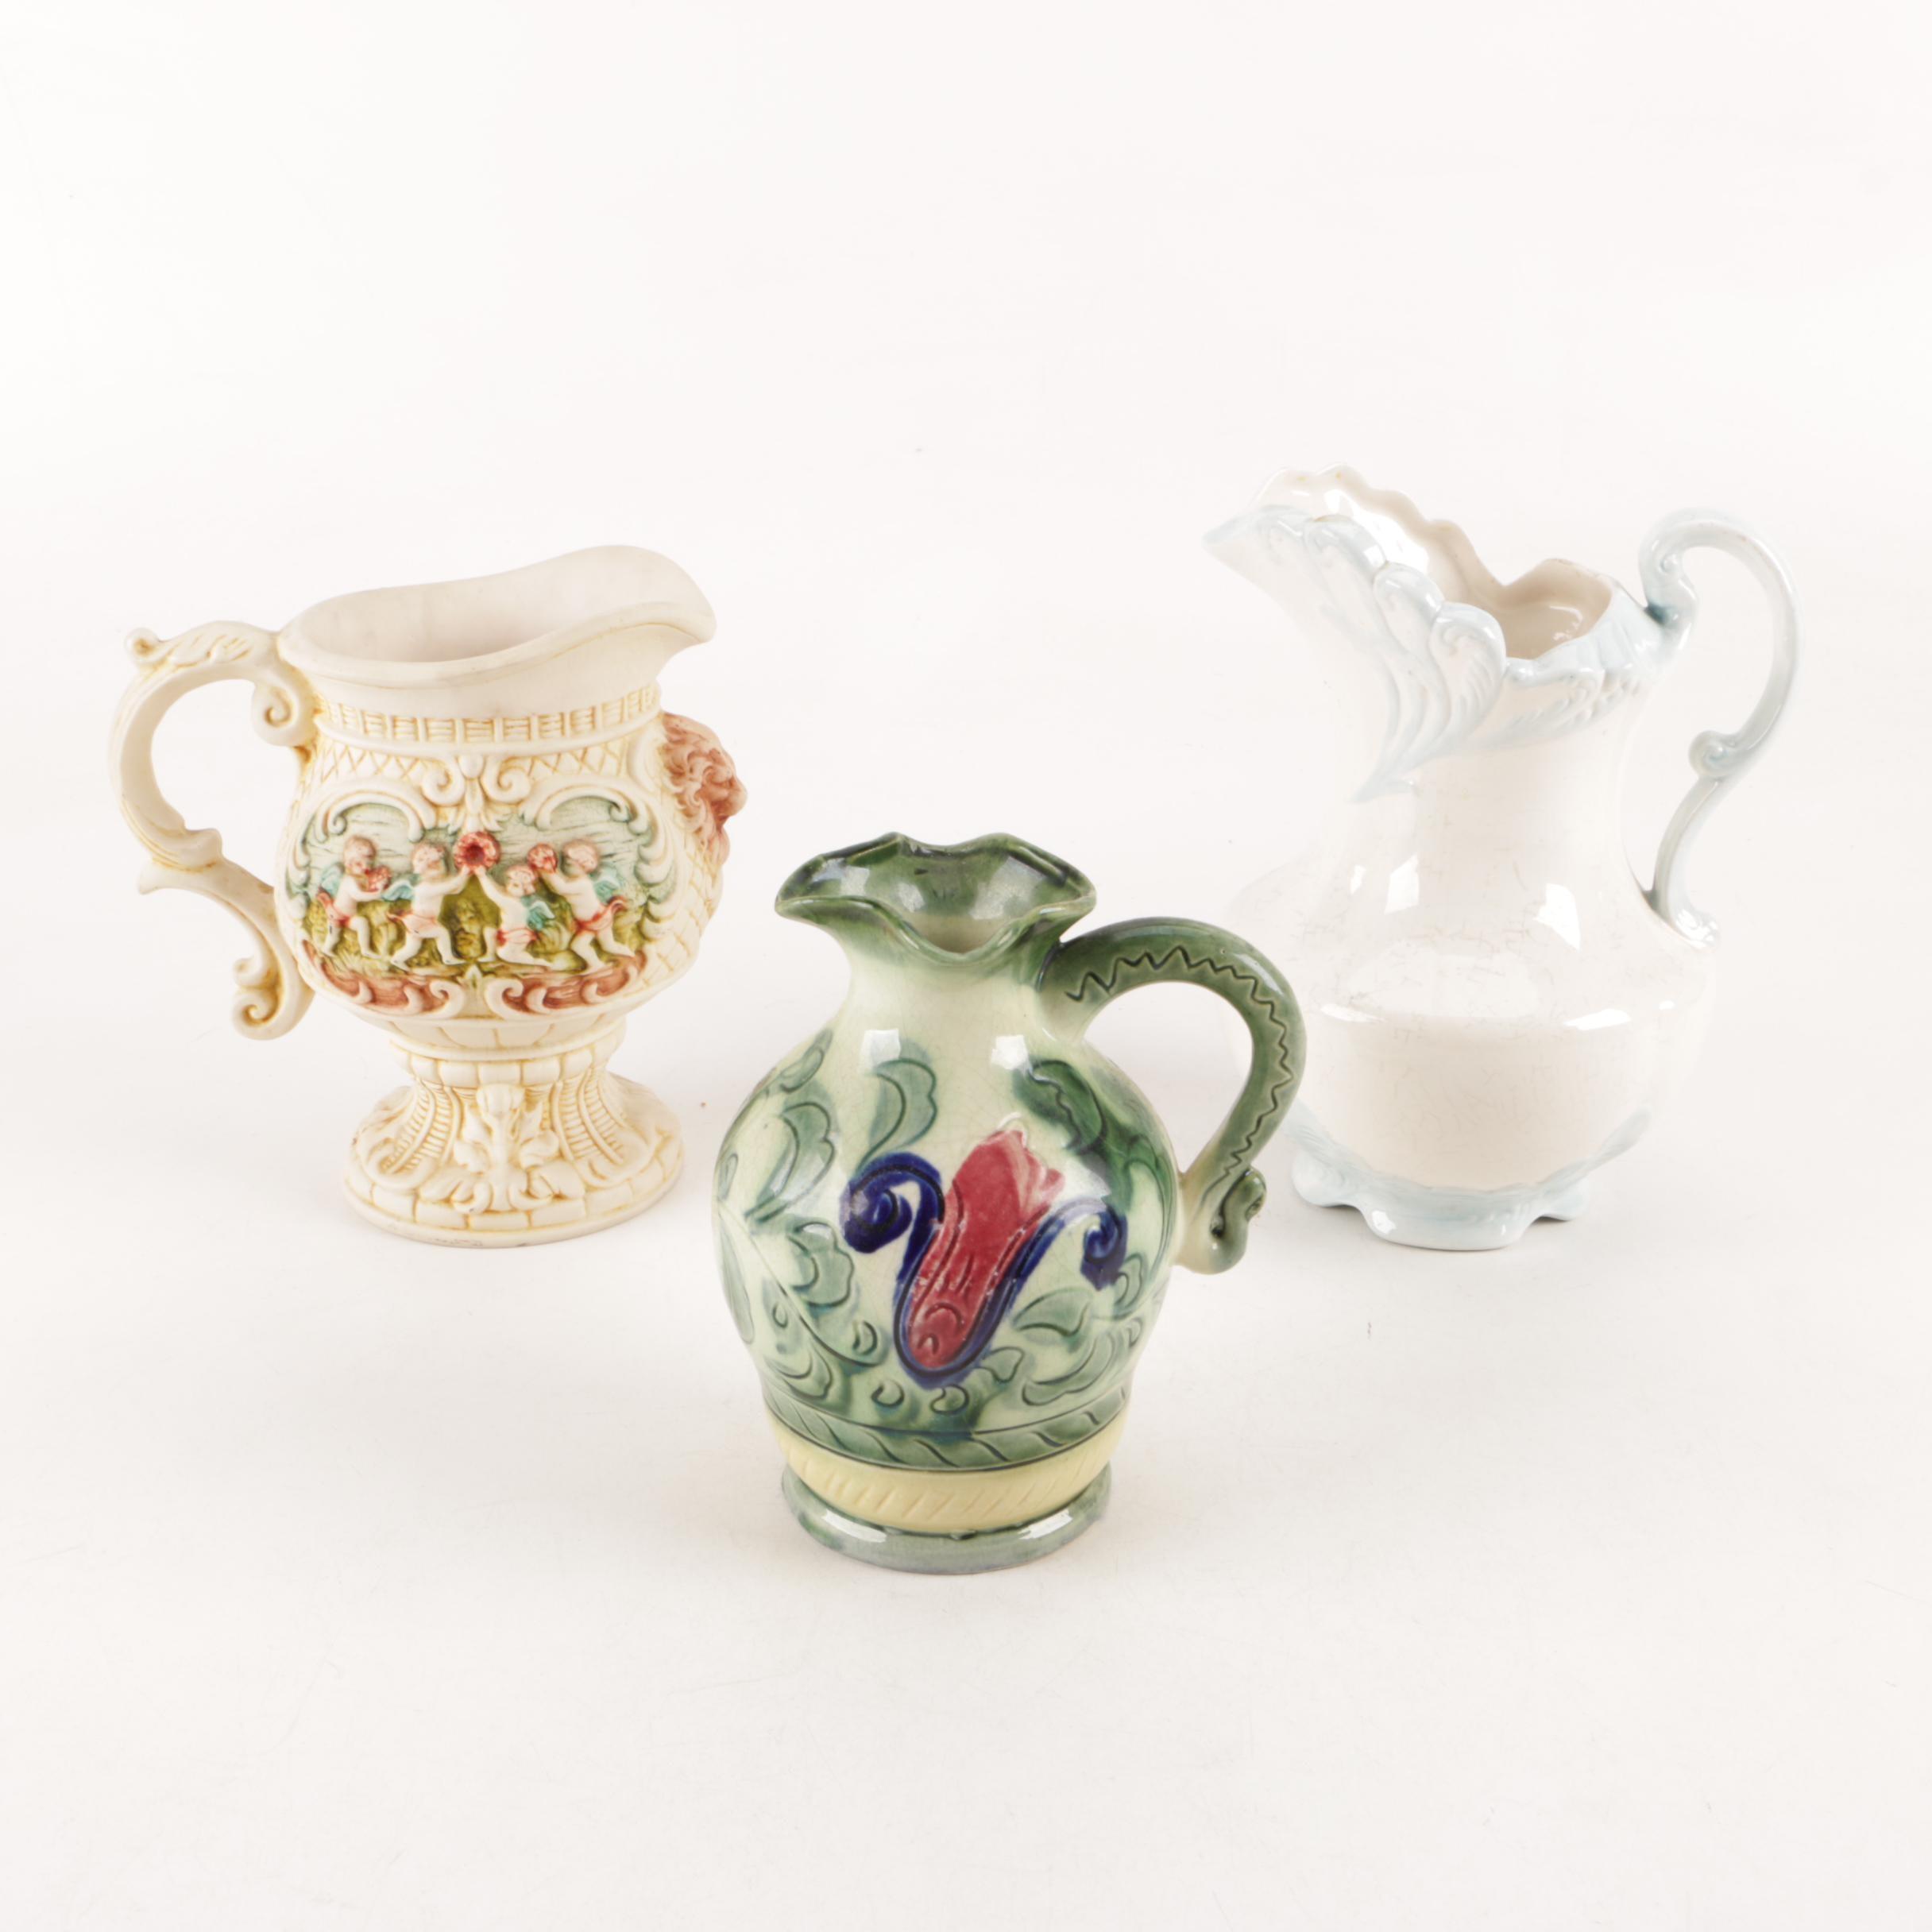 Capodimonte Style Cherub Pitcher and Ceramic Pitchers